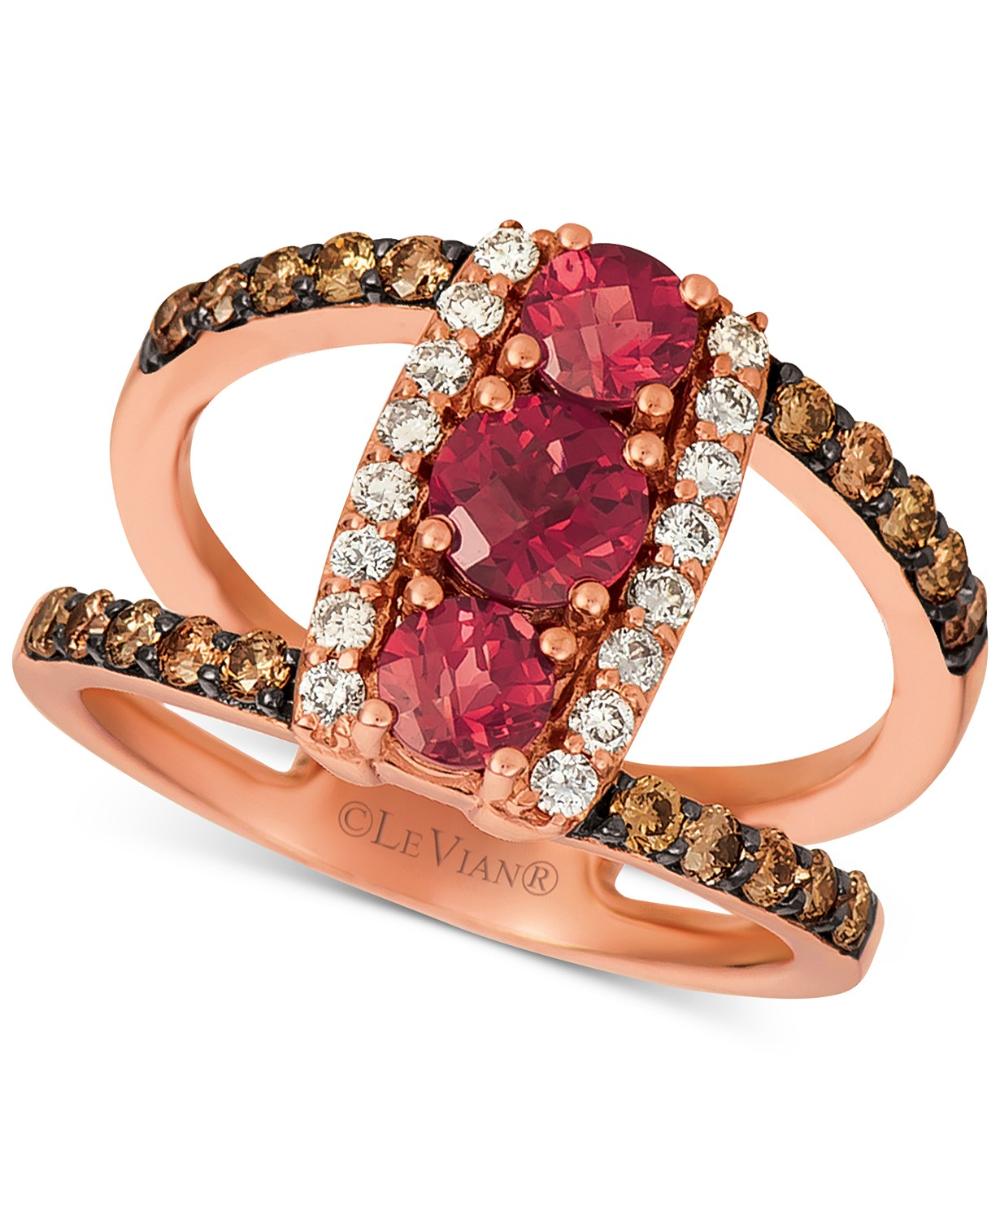 Le Vian Nude Diamond Ring 2-1/4 ct tw Round-cut 14K Honey